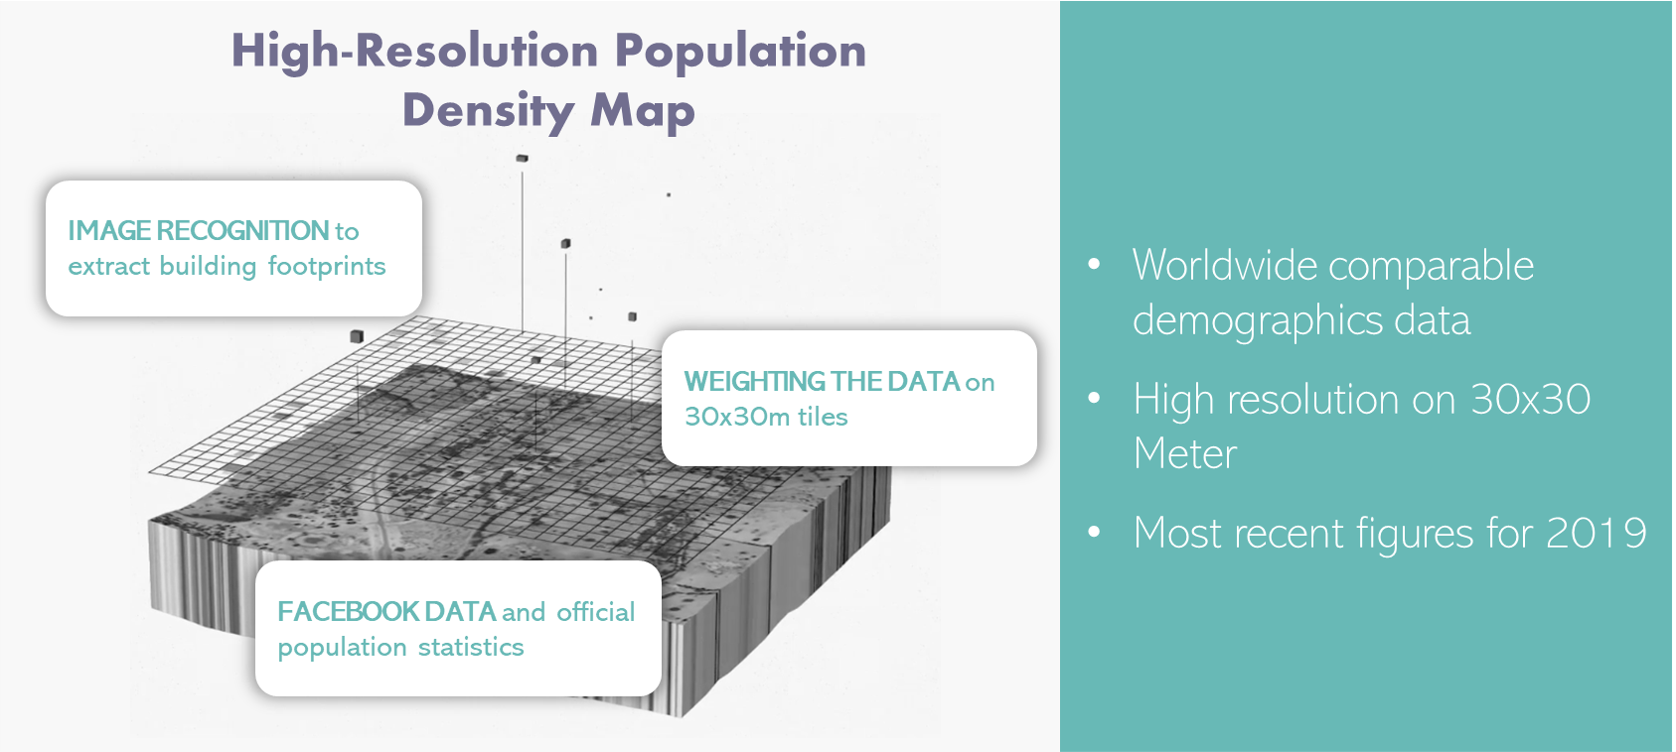 Population Density Overview